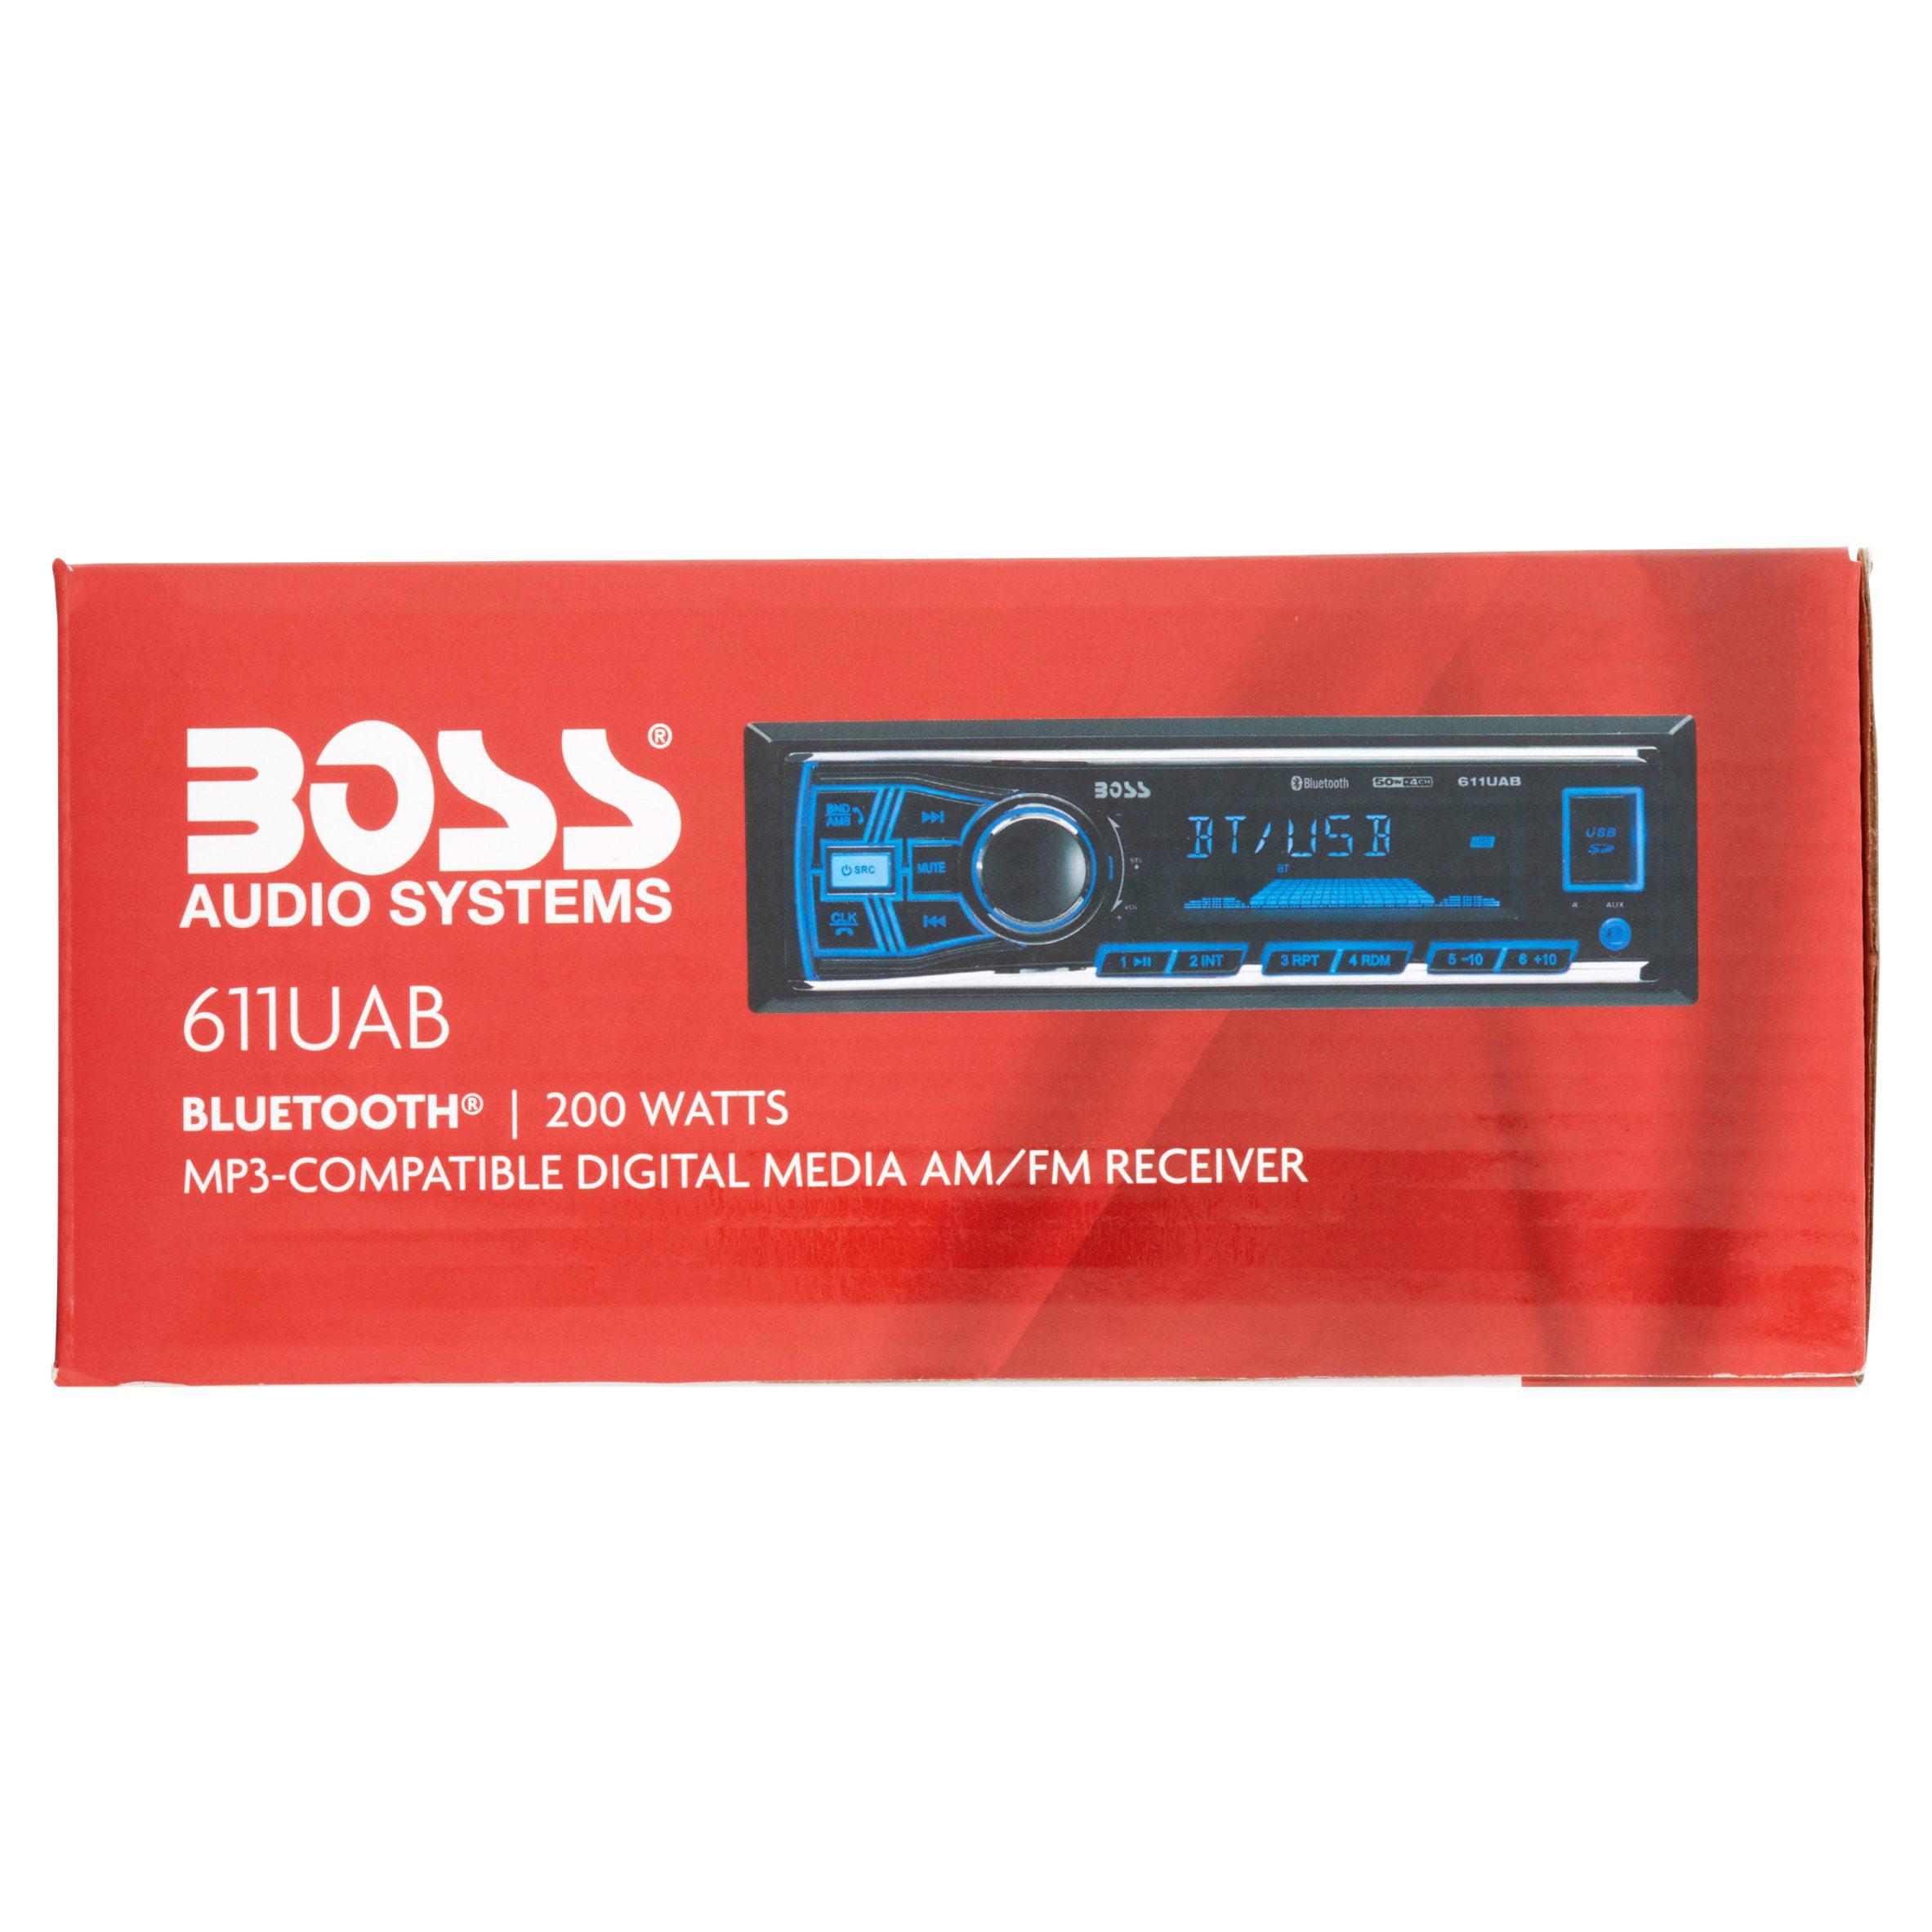 Boss 611UAB Boss Audio 611UAB Single-DIN MECH-LESS Receiver, Bluetooth -  In-dash - MP3, WMA - AM, FM - 12, 18 x AM, FM Preset - SD - Bluetooth - USB  ...